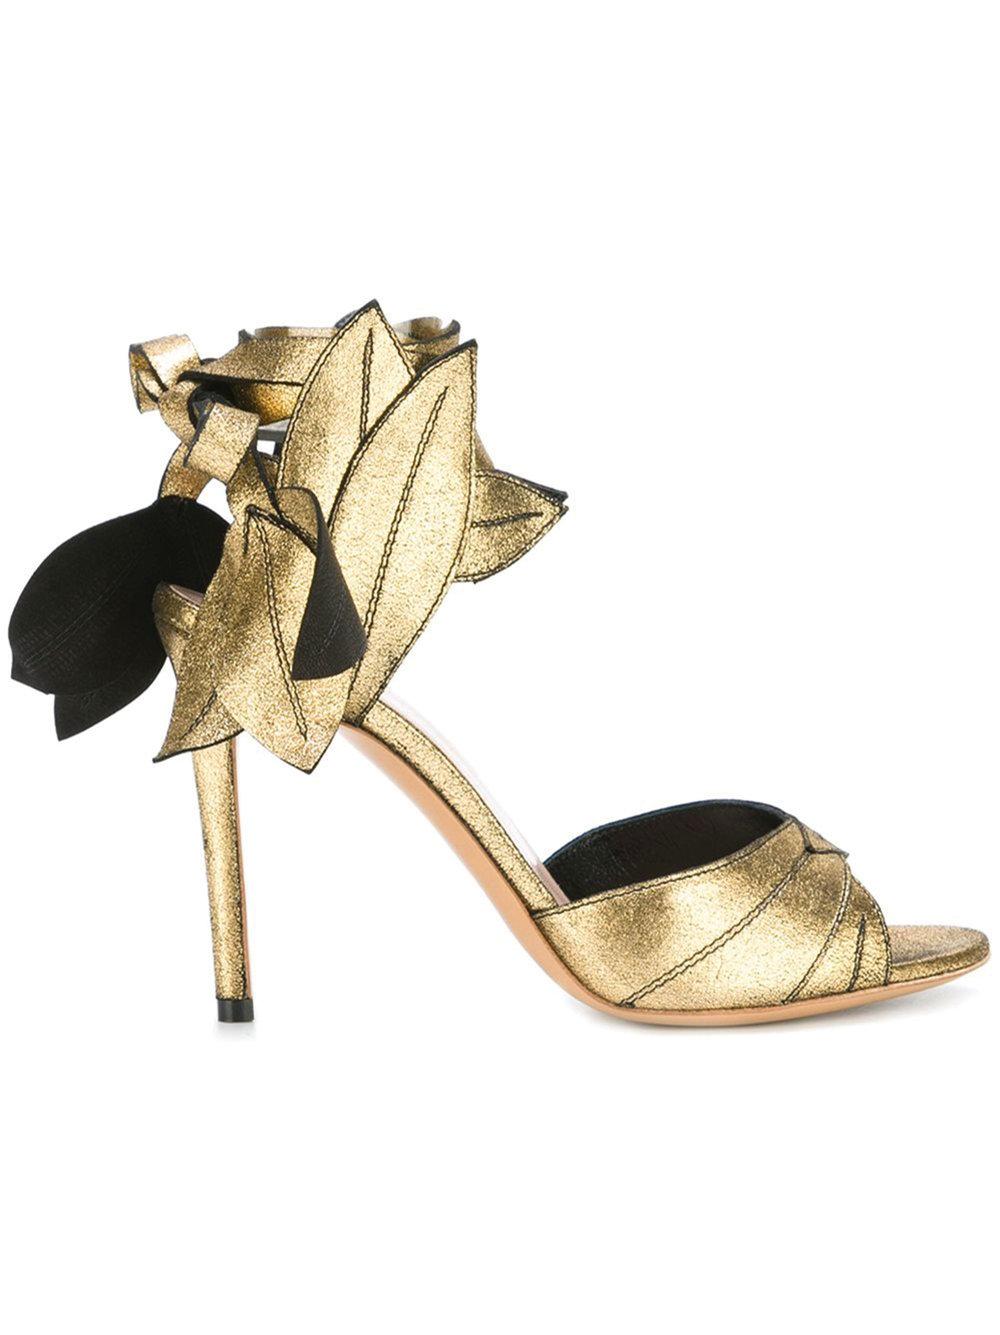 10.Vivienne Westwood 高跟鞋 $535.50,  farfetch.ca